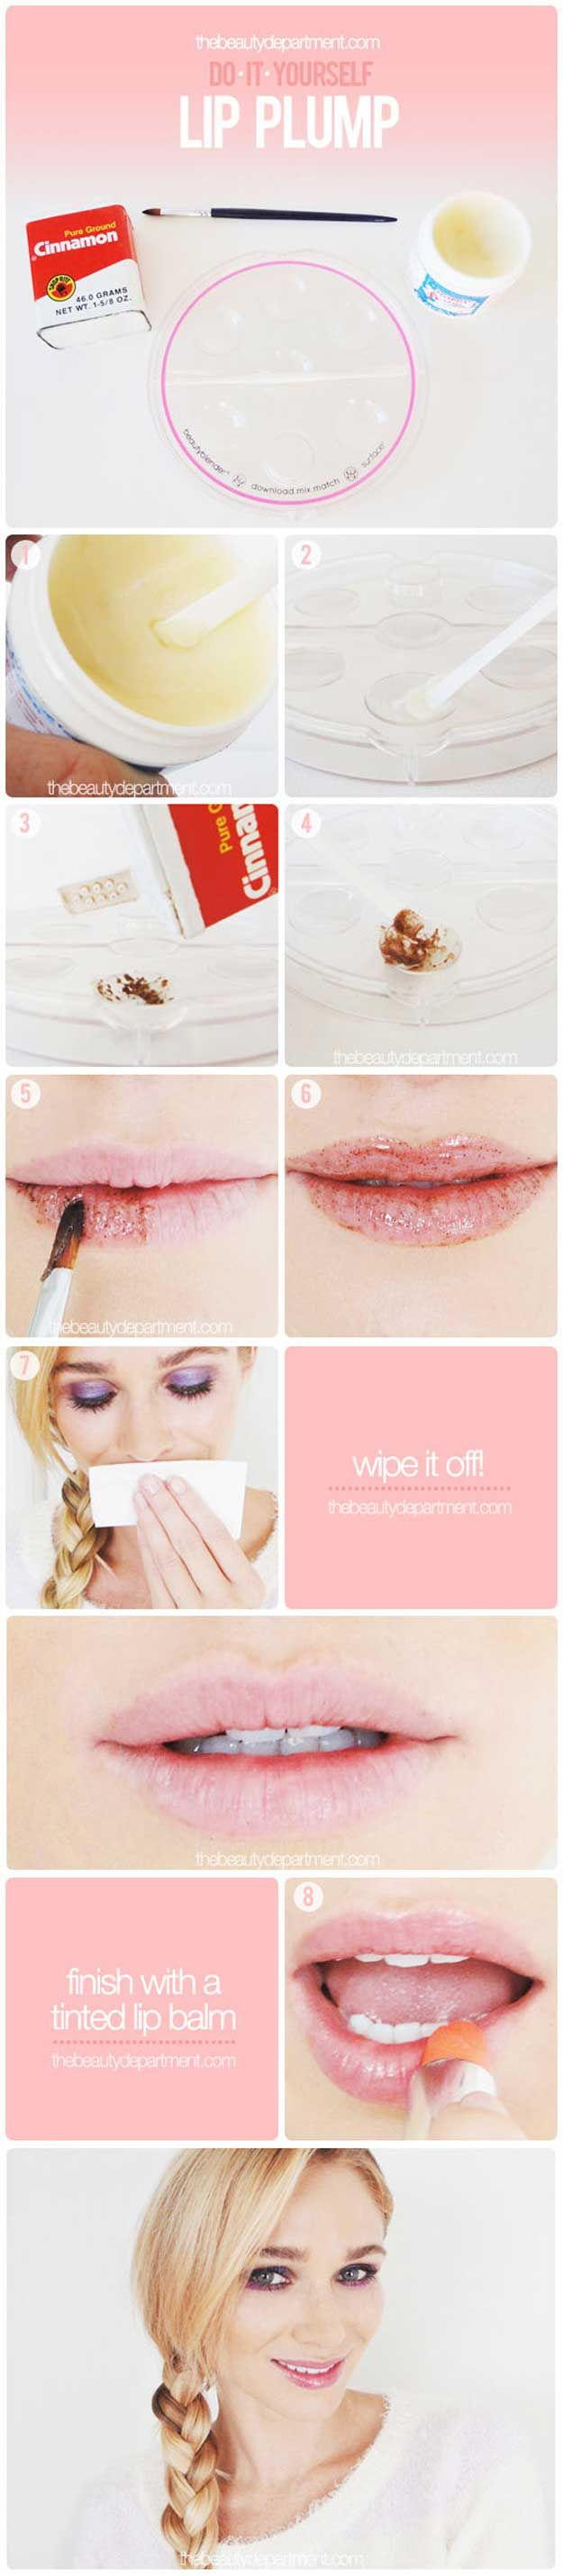 How to Make Lips Bigger